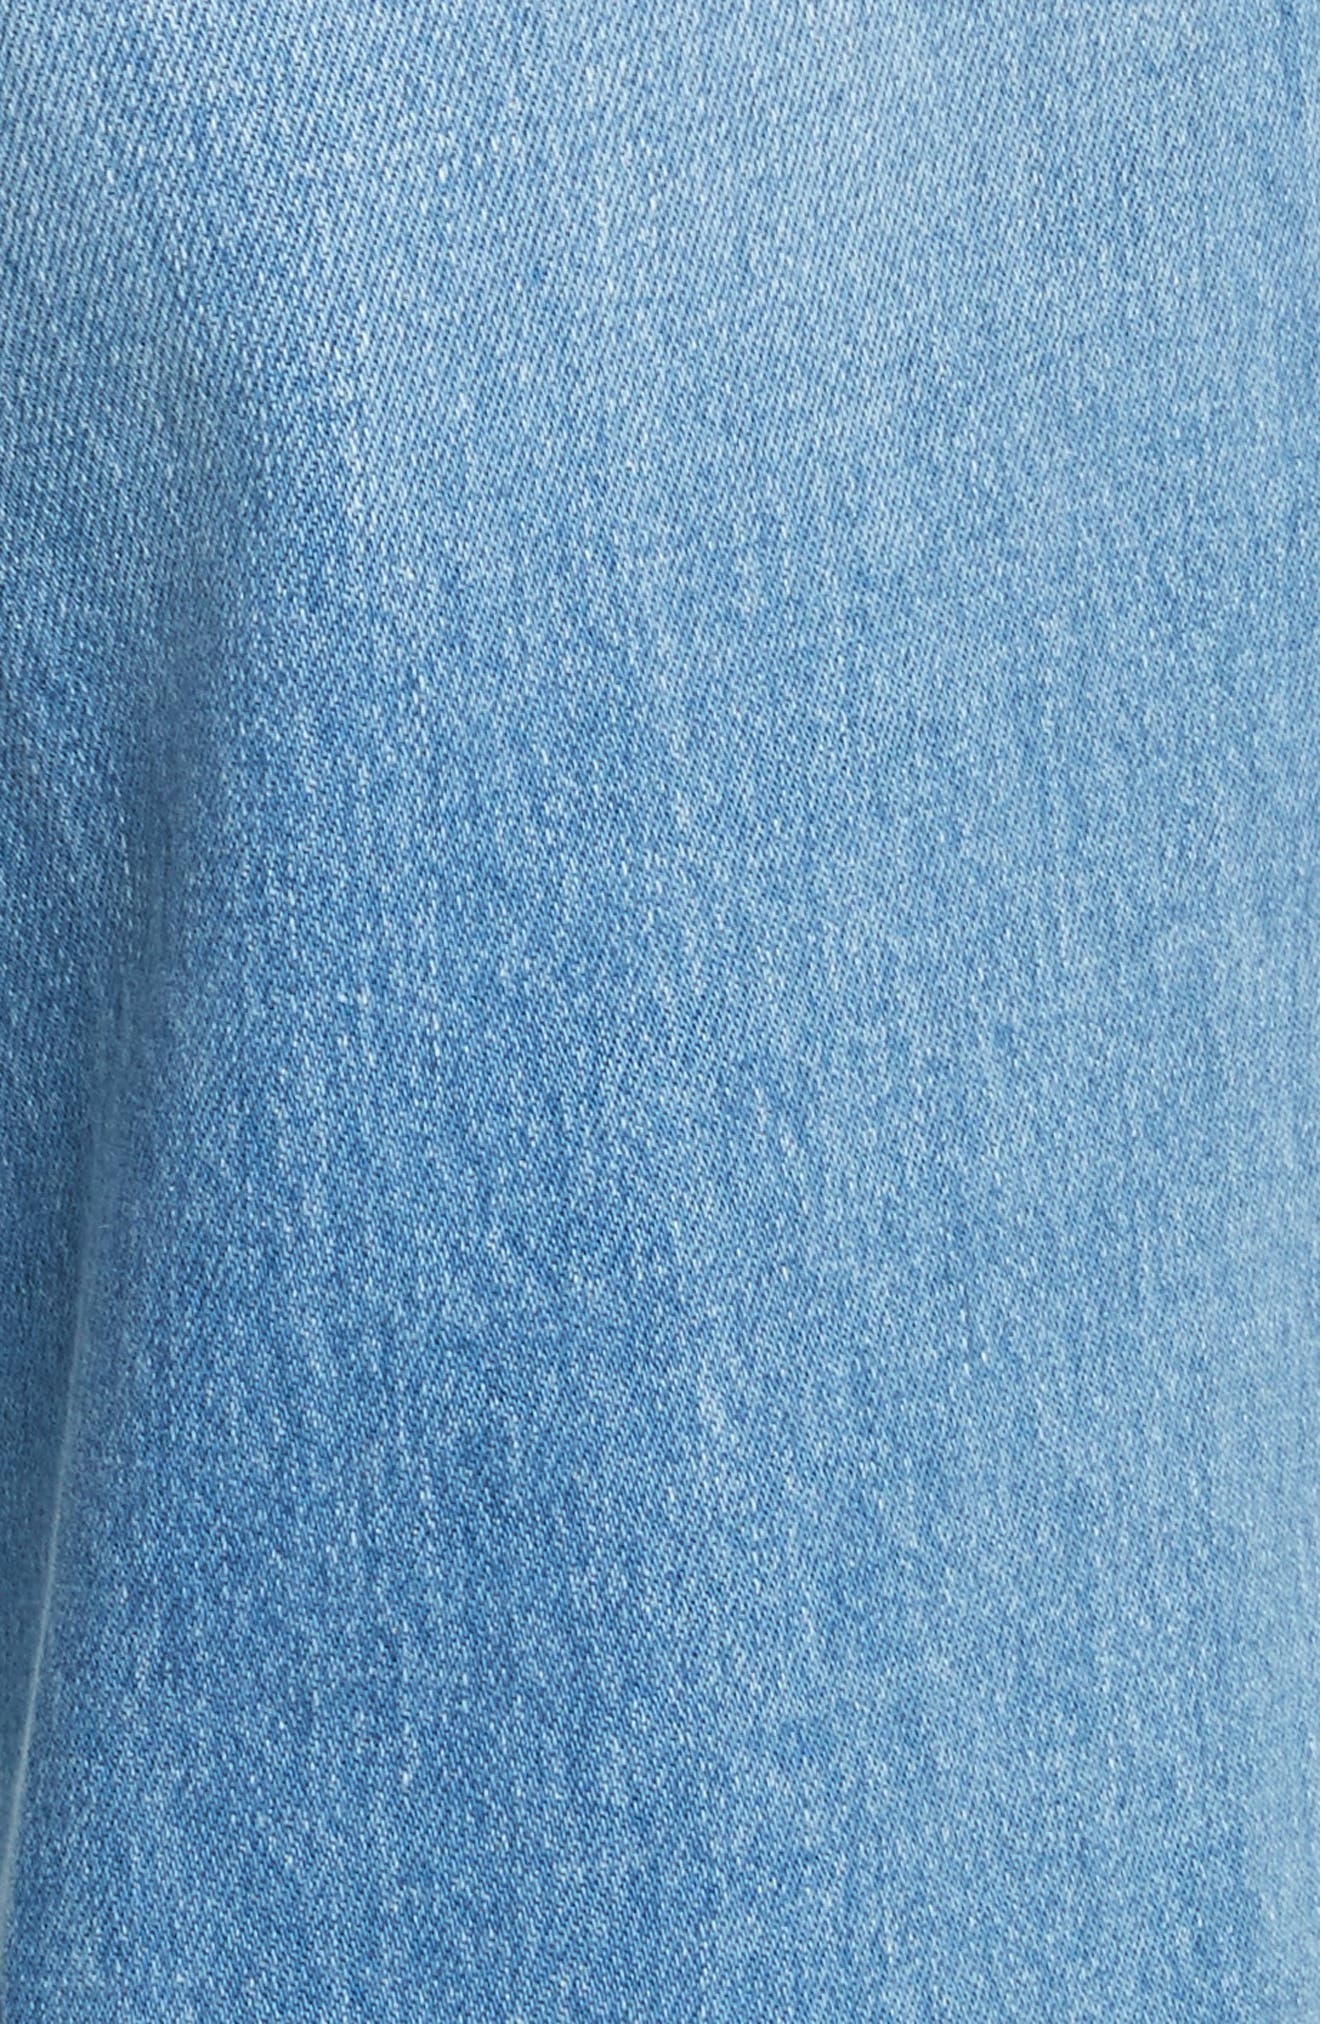 Le Palazzo High Waist Raw Edge Jeans,                             Alternate thumbnail 6, color,                             Opus